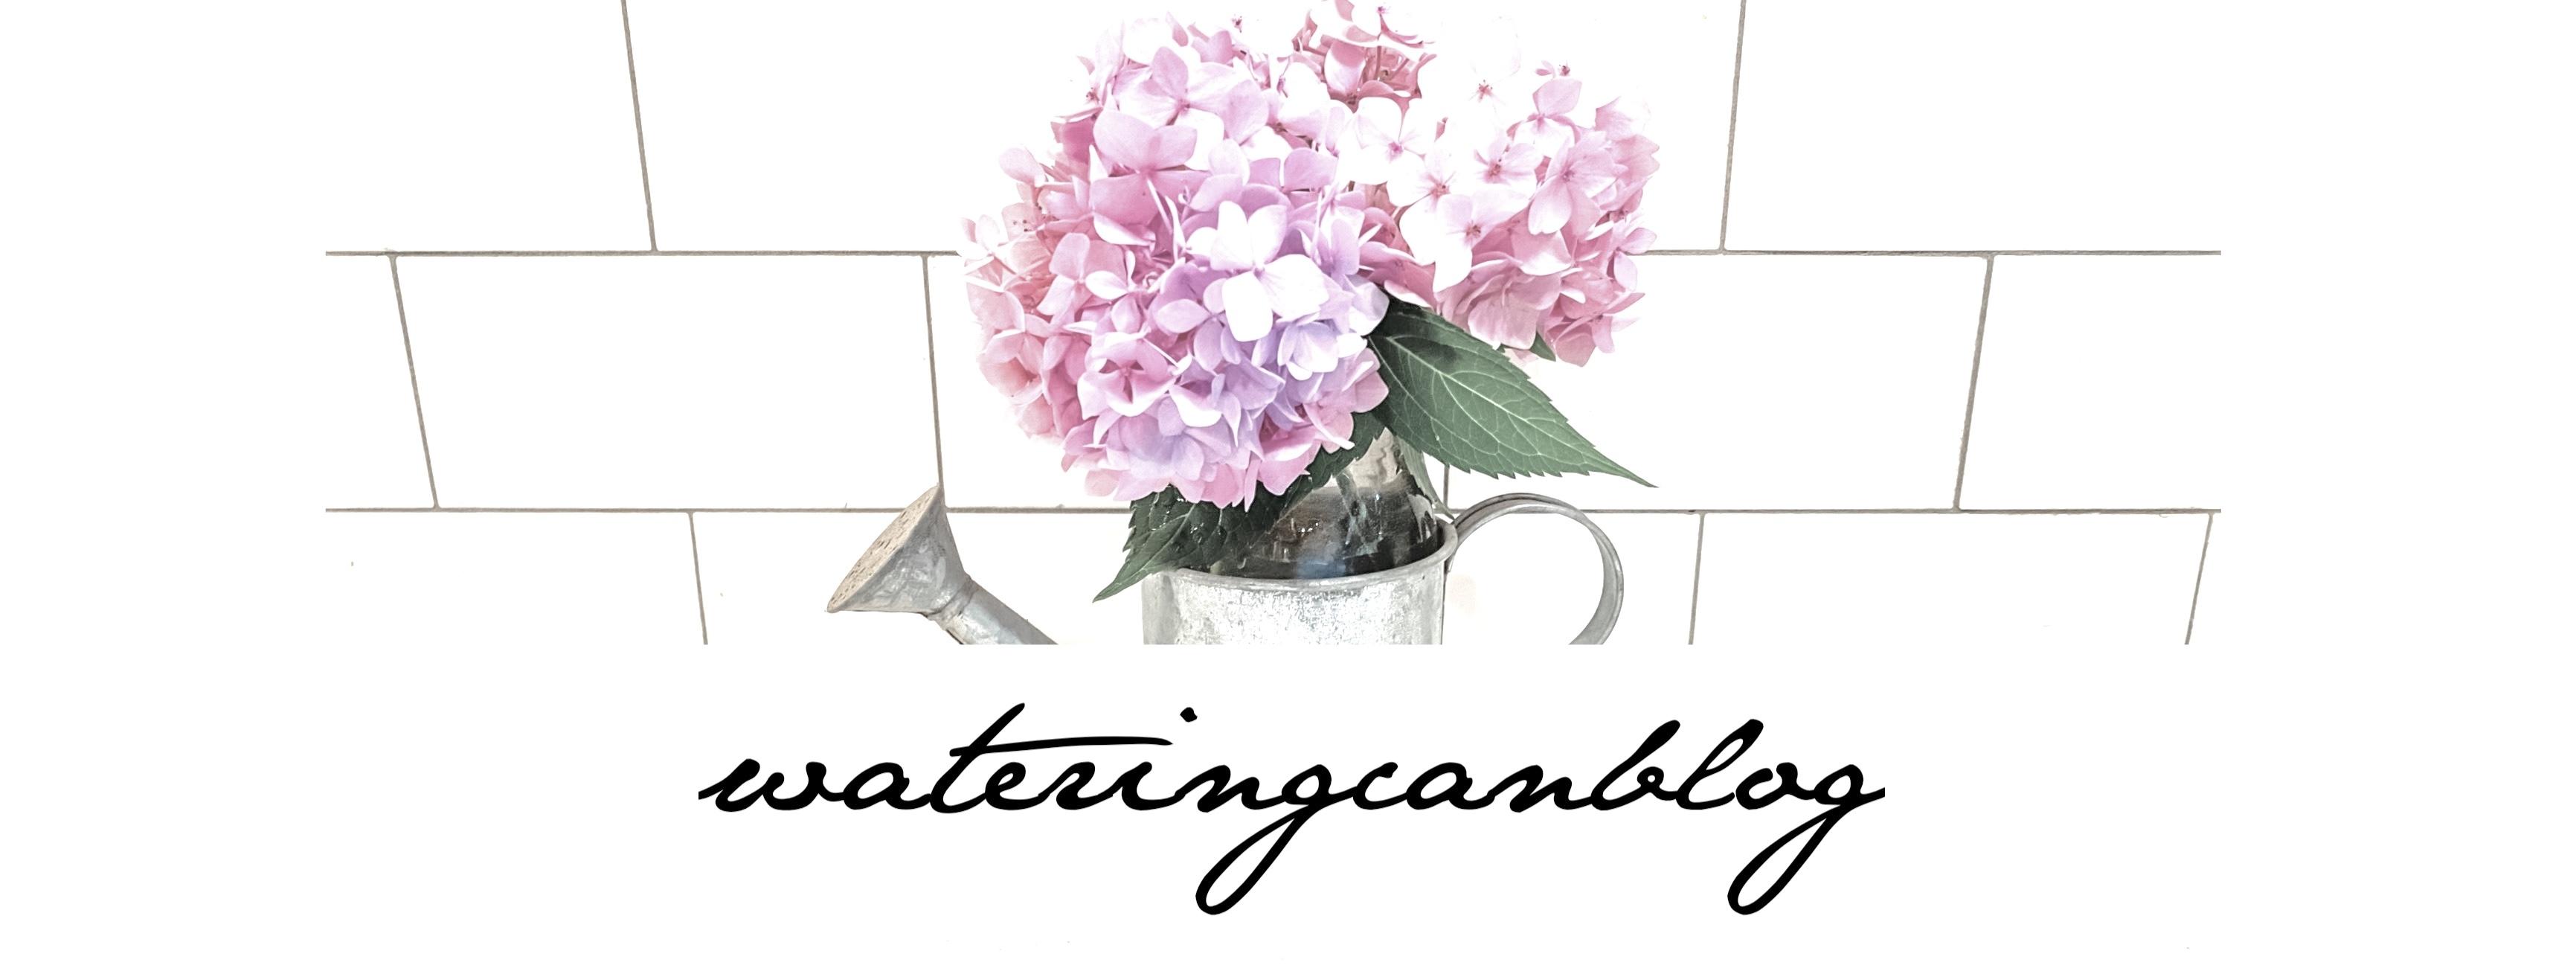 wateringcanblog